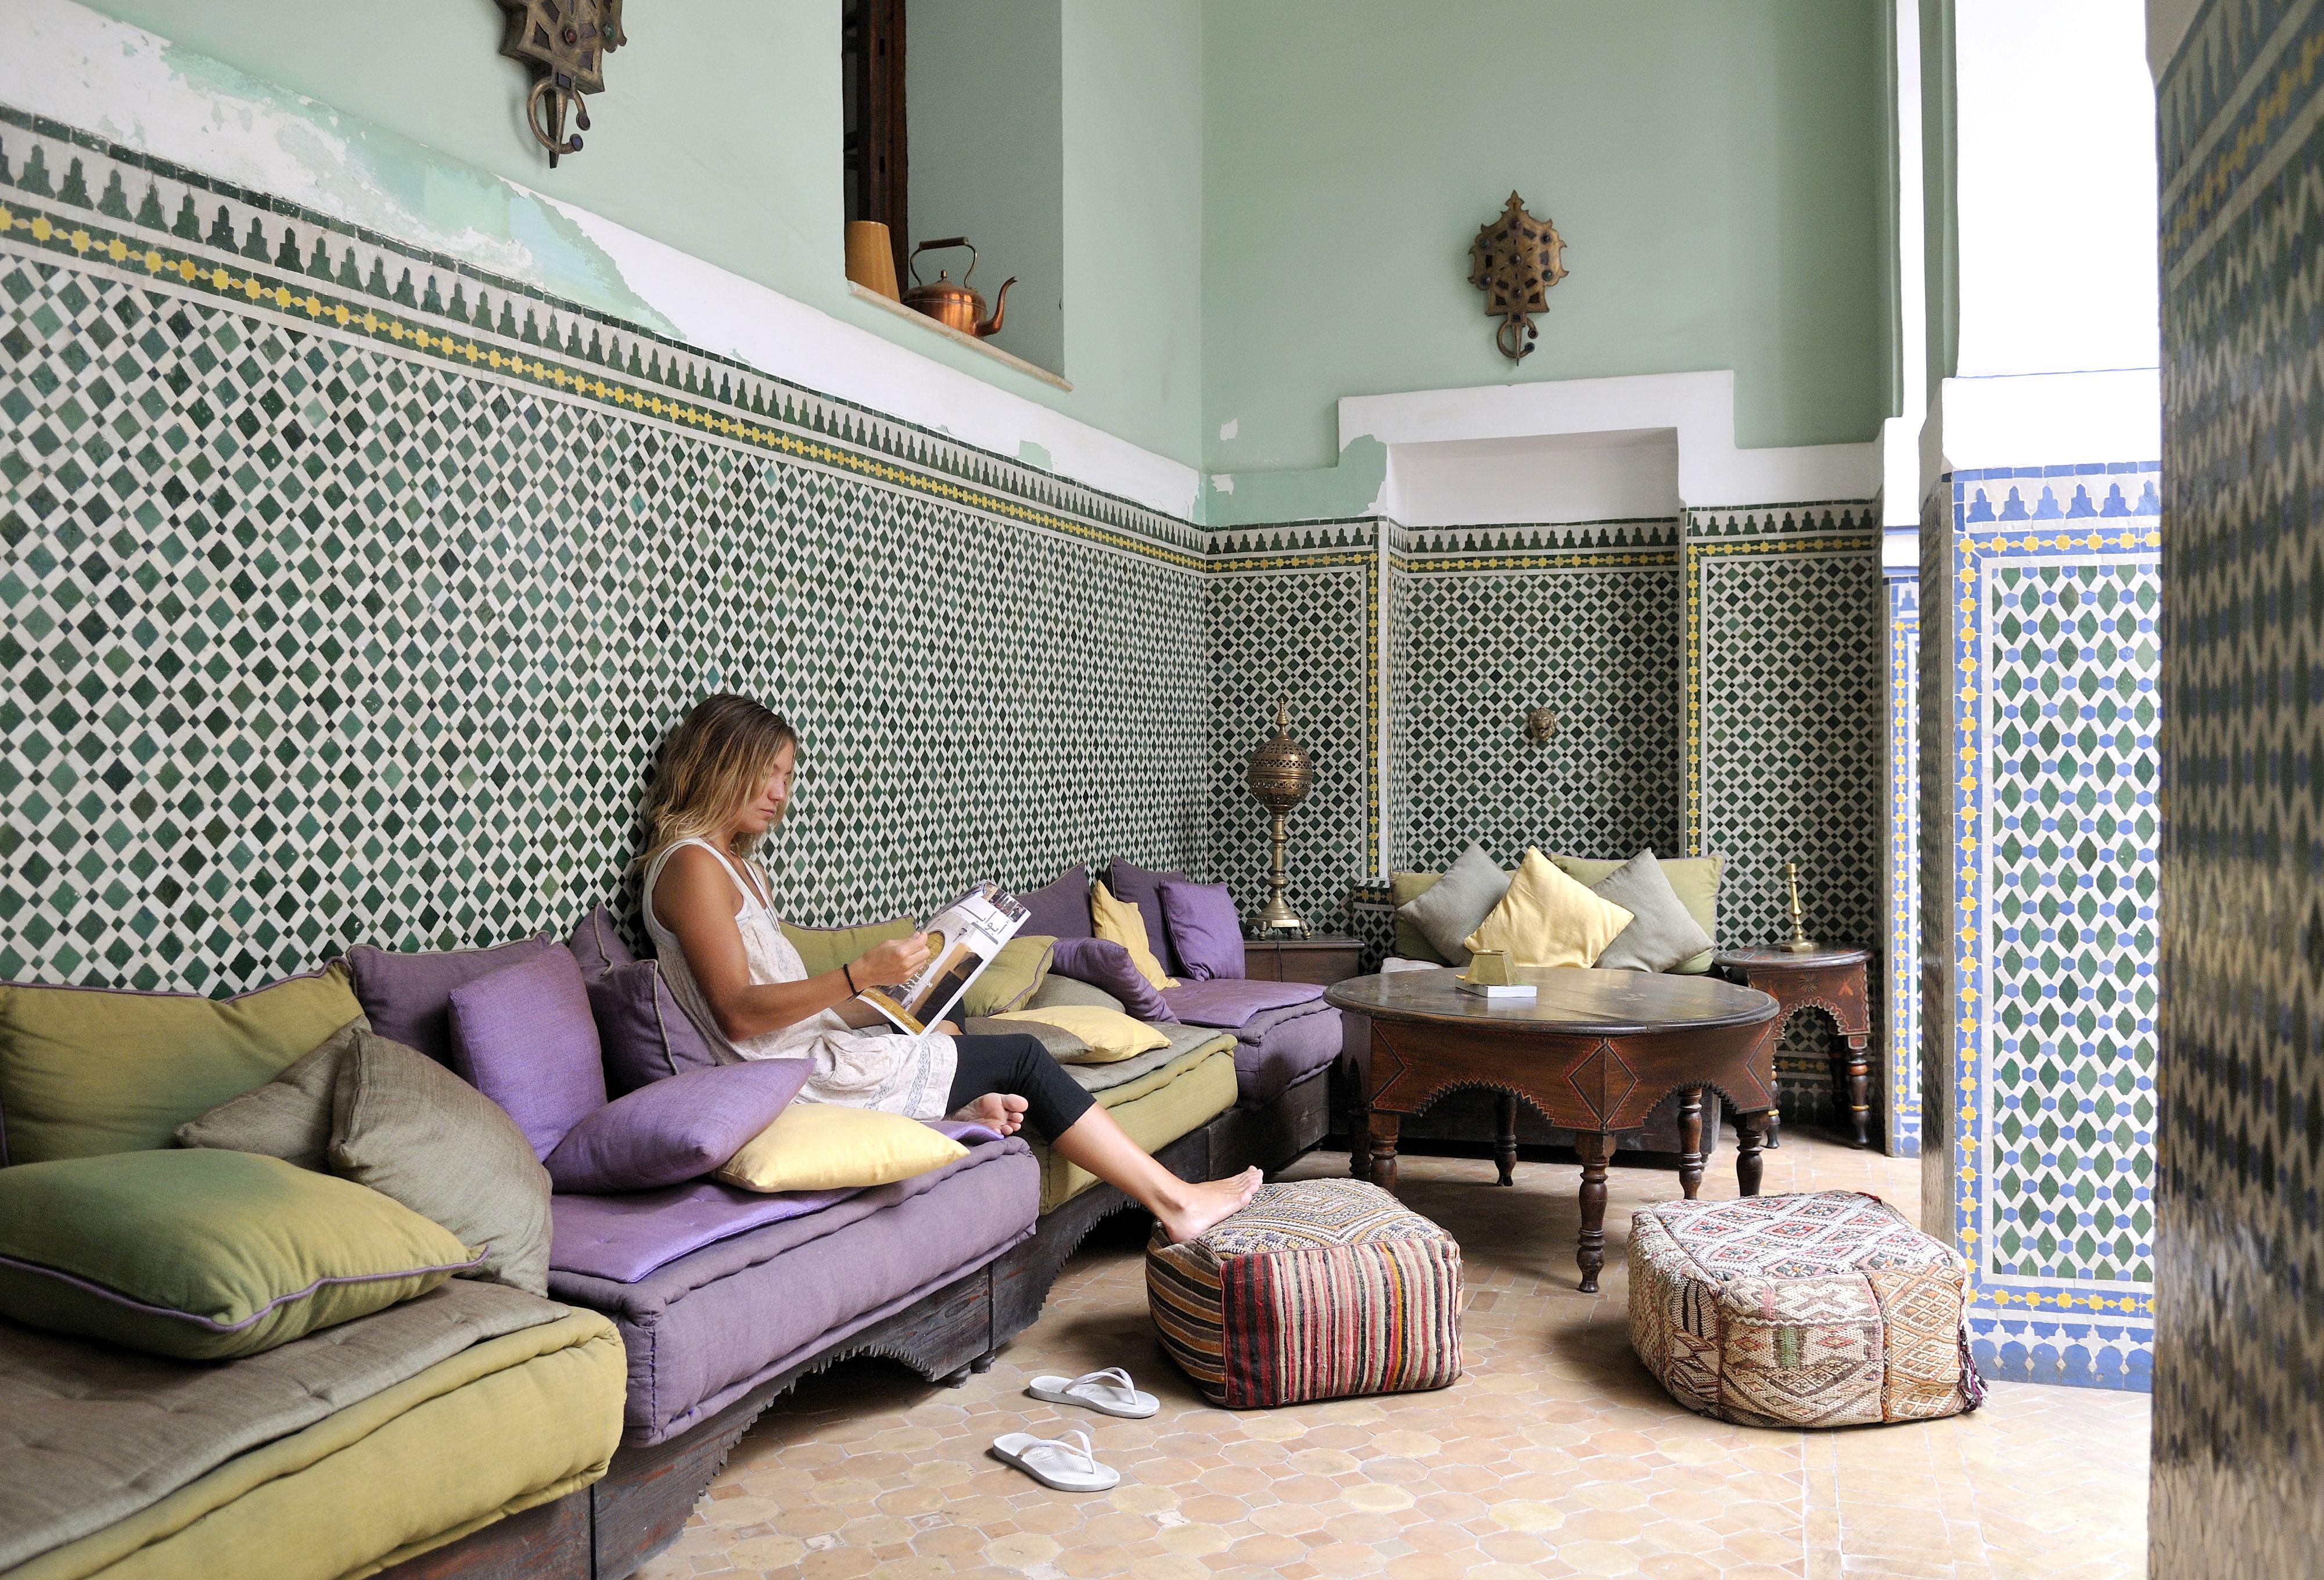 Hostel marrakech: equity point